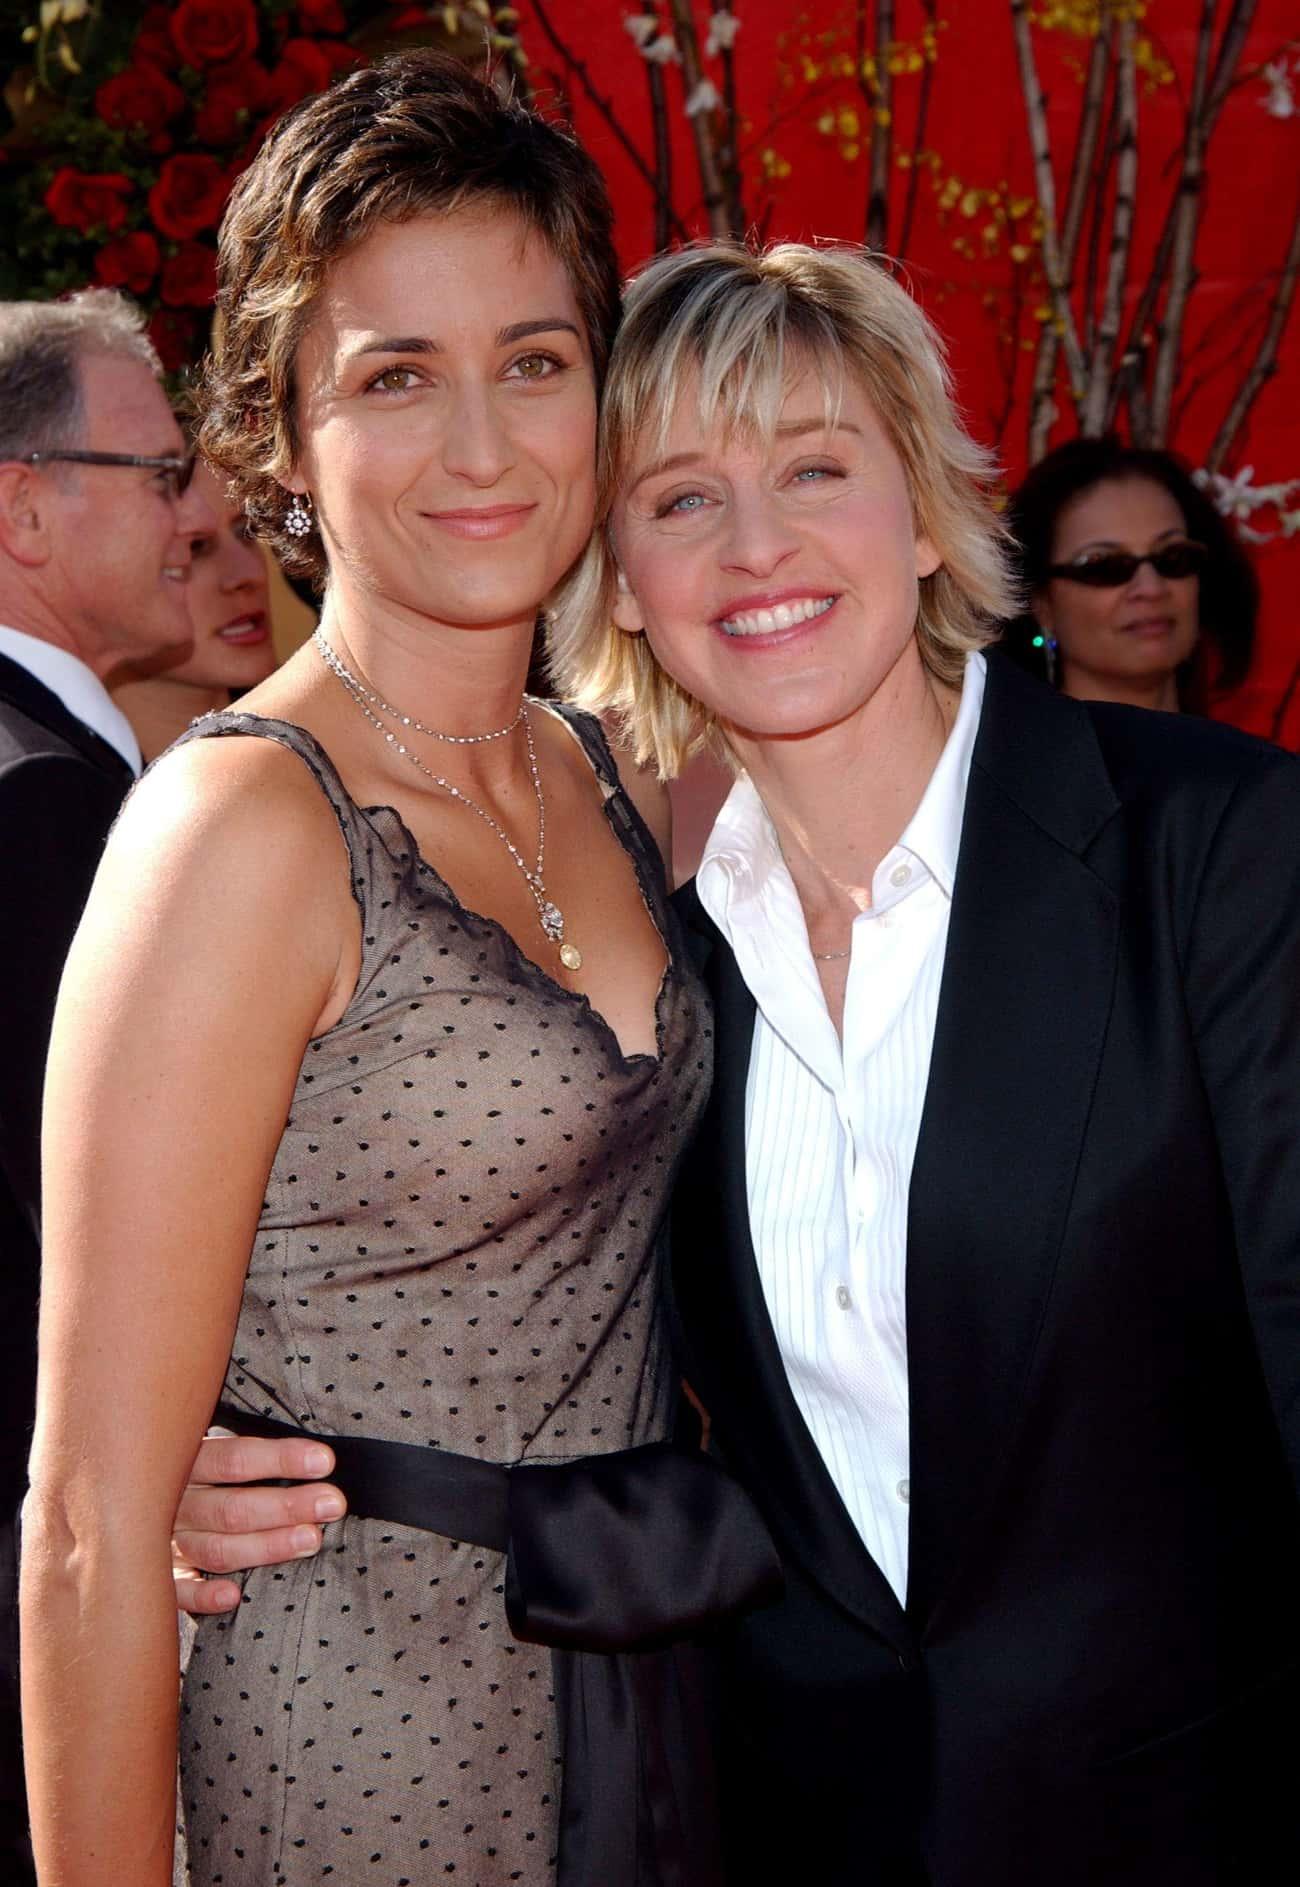 Anne Heche Says Romance With Ellen DeGeneres Got Her Fired